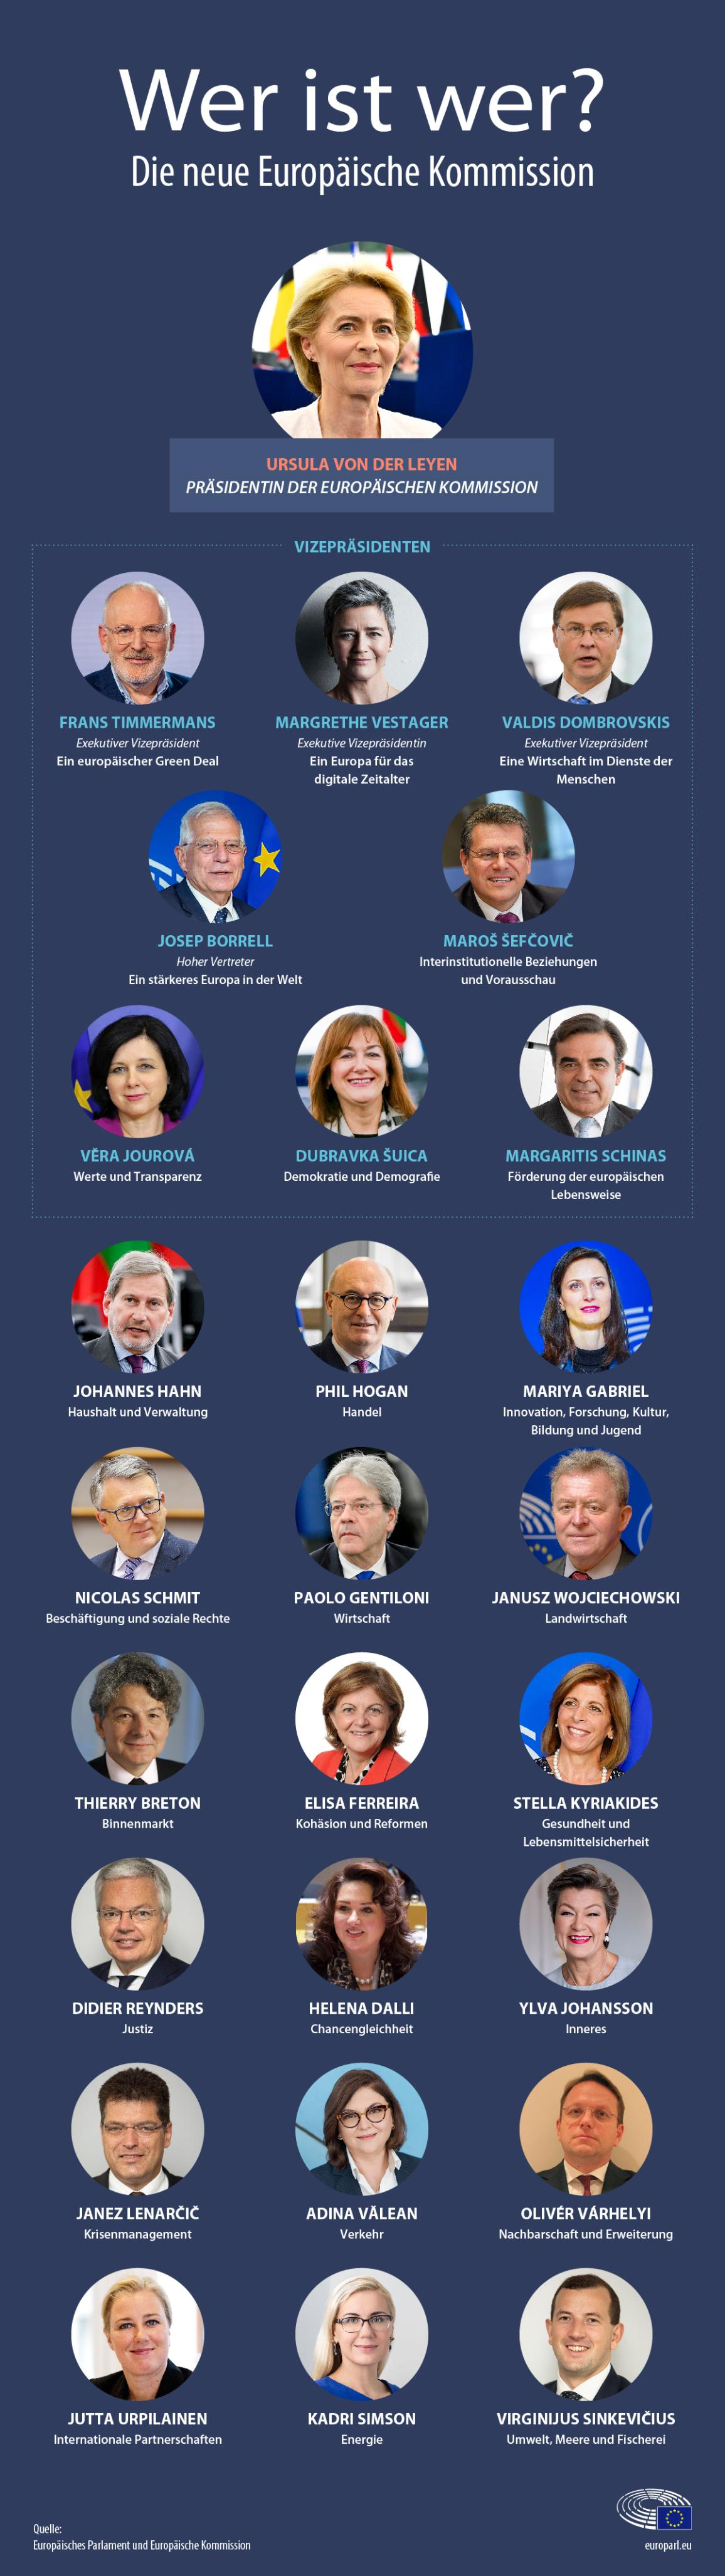 Infografik zum Kommissionskollegium